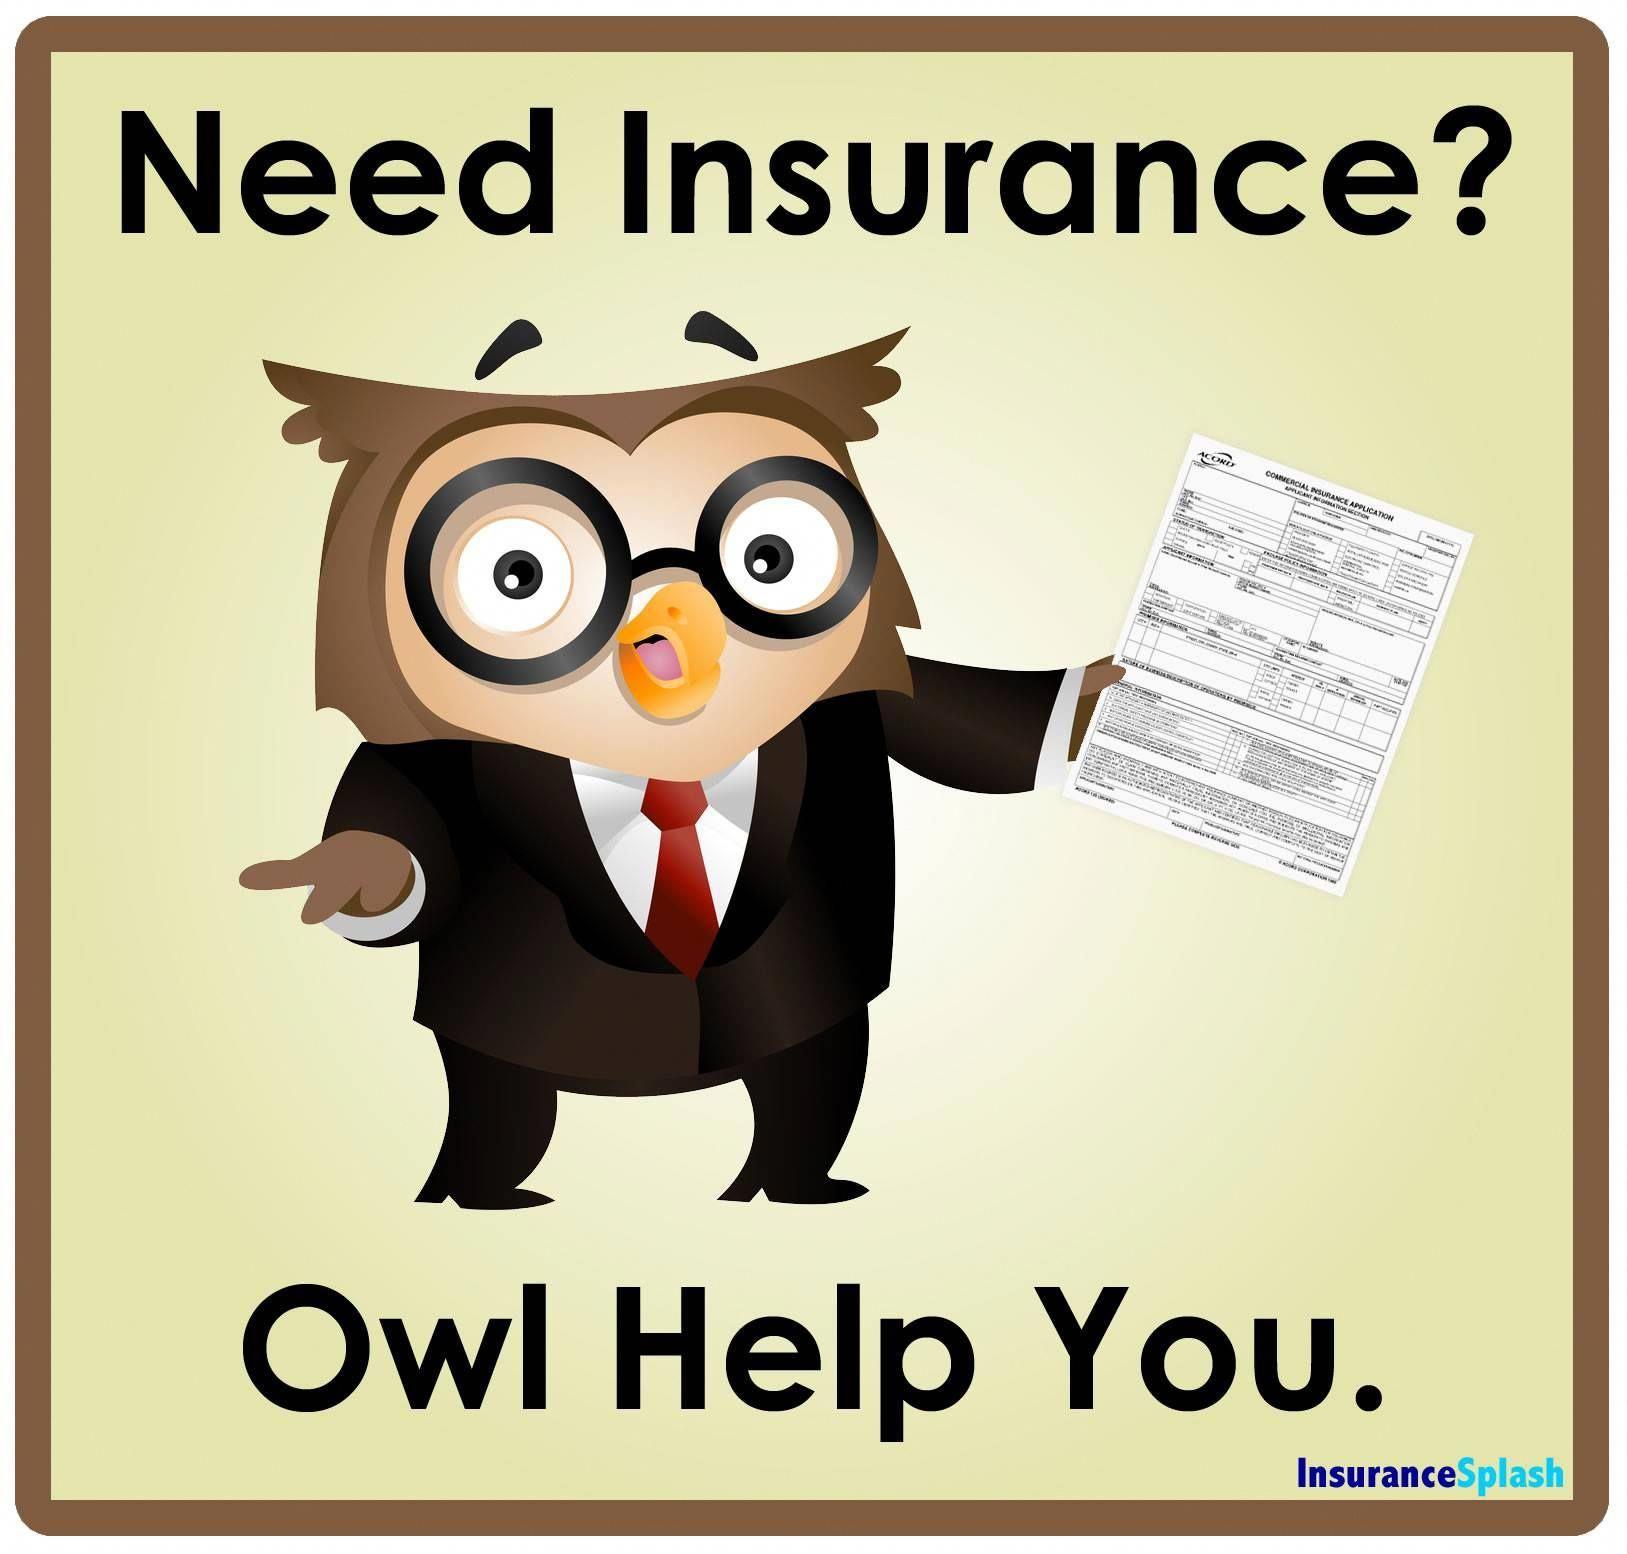 Whoooo needs insurance? Home insurance quotes, Life